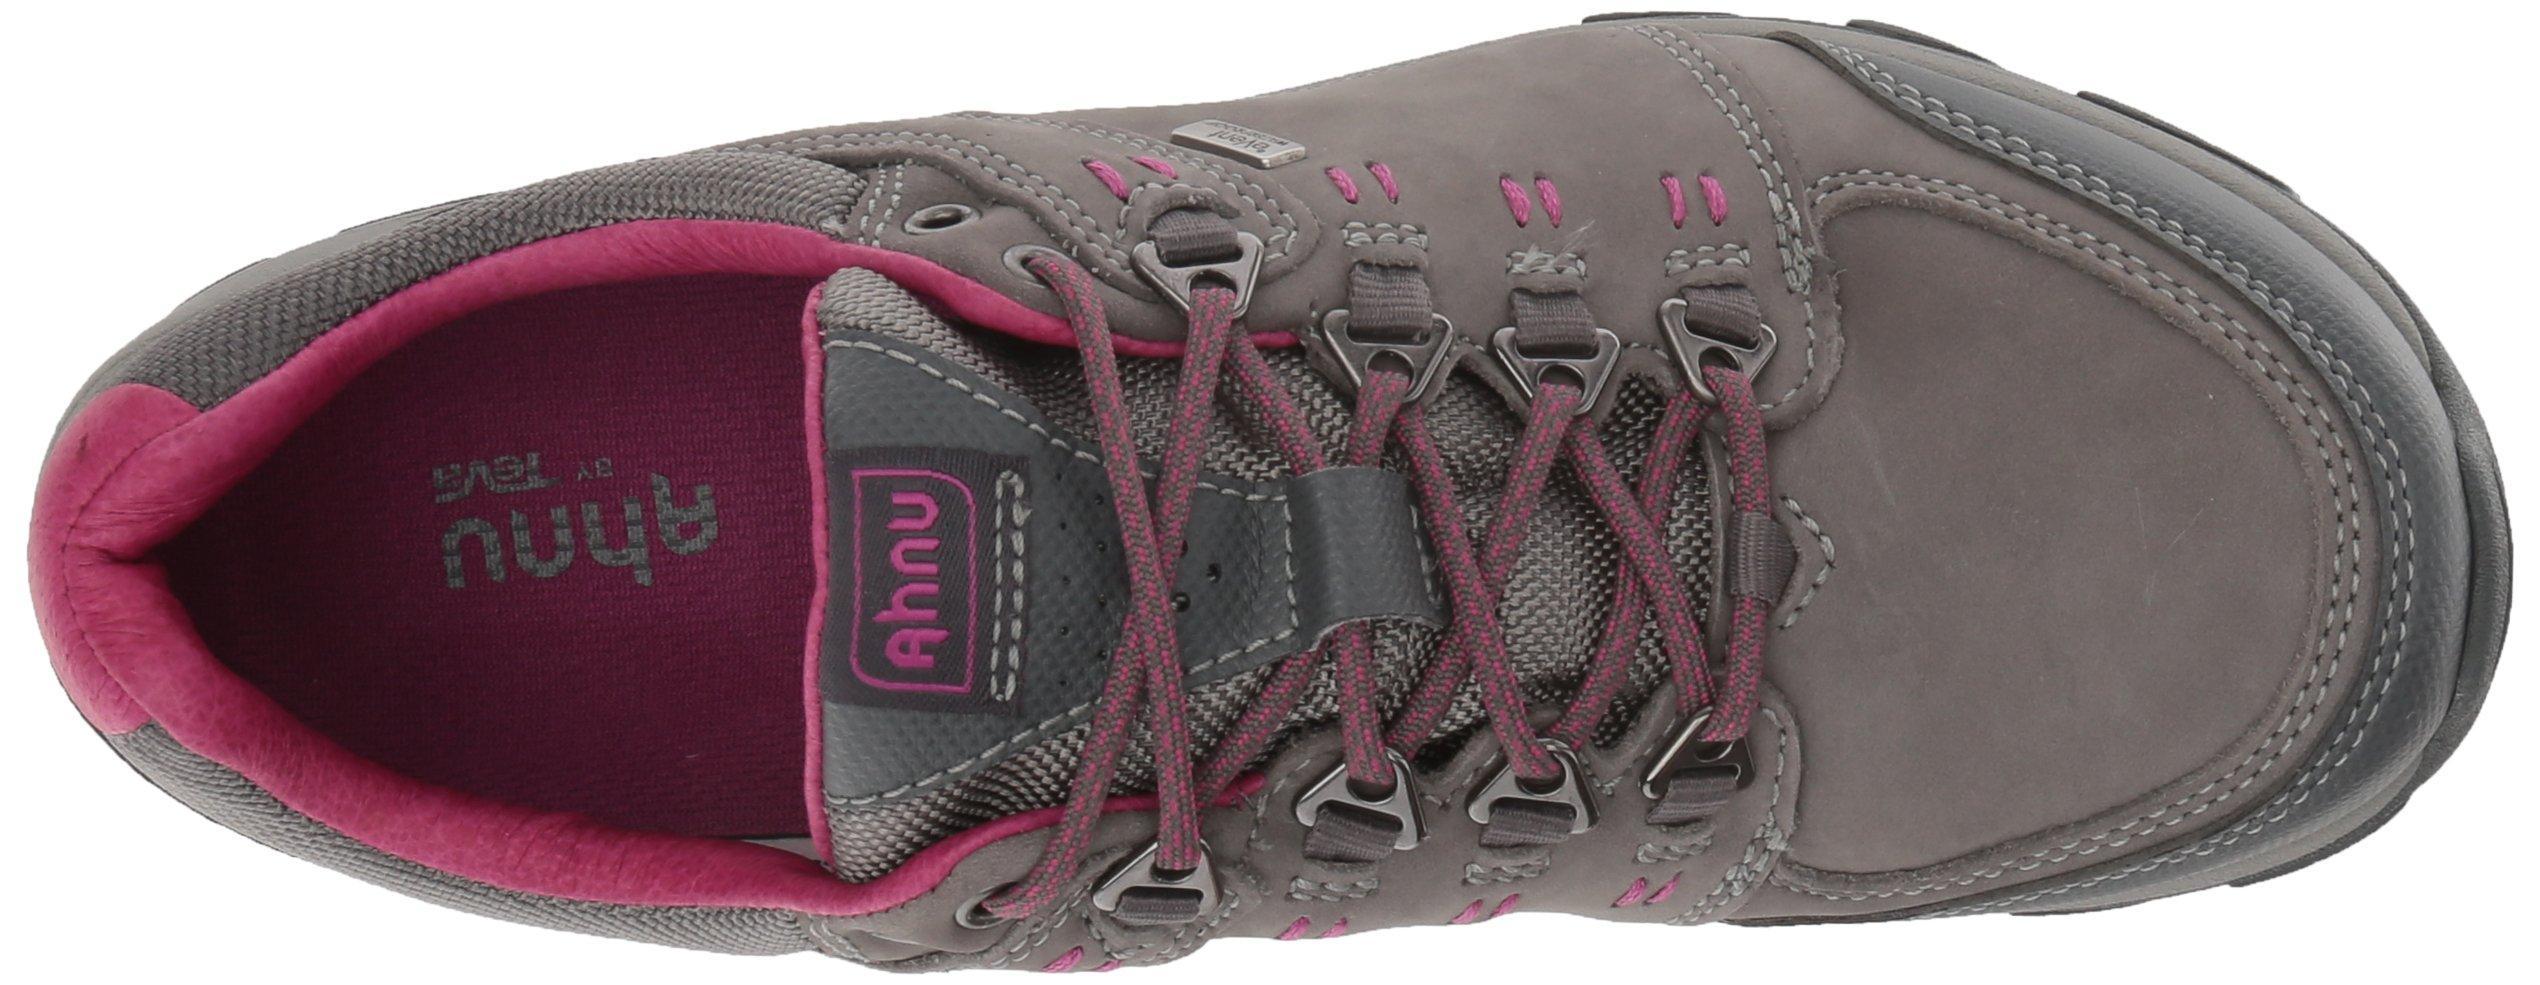 Ahnu Women's W Montara III Event Hiking Boot, Charcoal, 6 Medium US by Ahnu (Image #8)